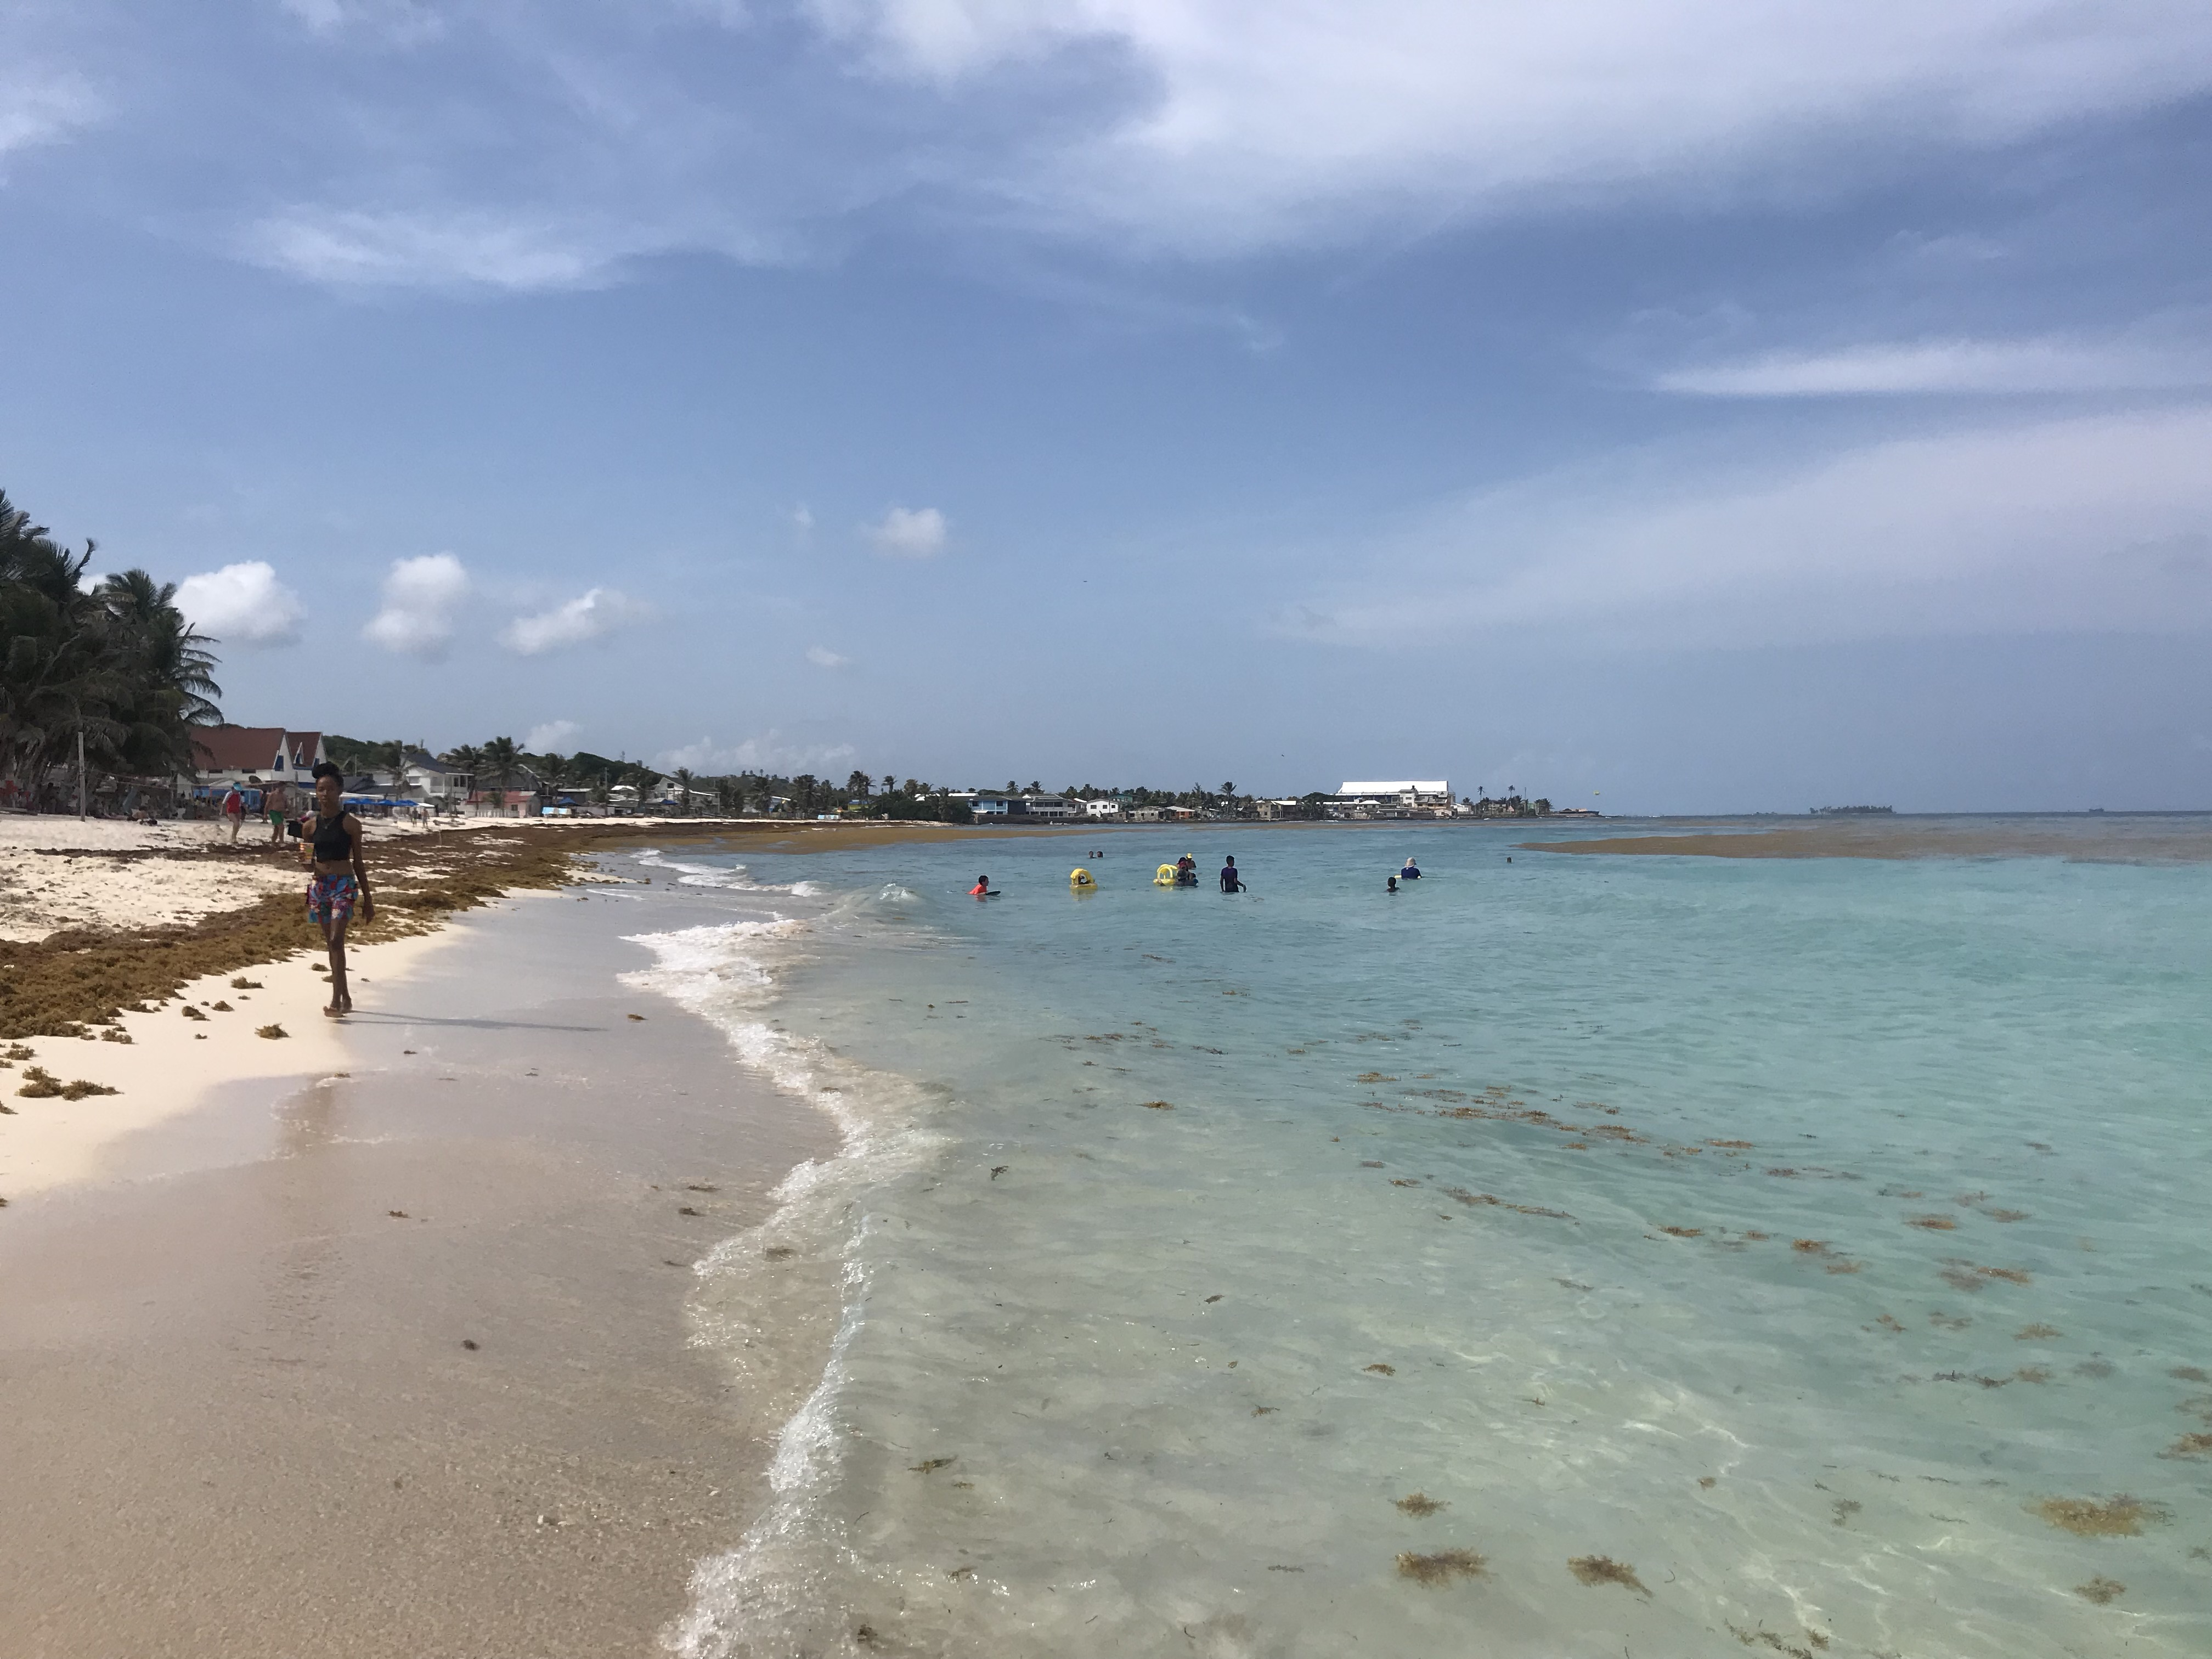 Beach with green aqua clear water